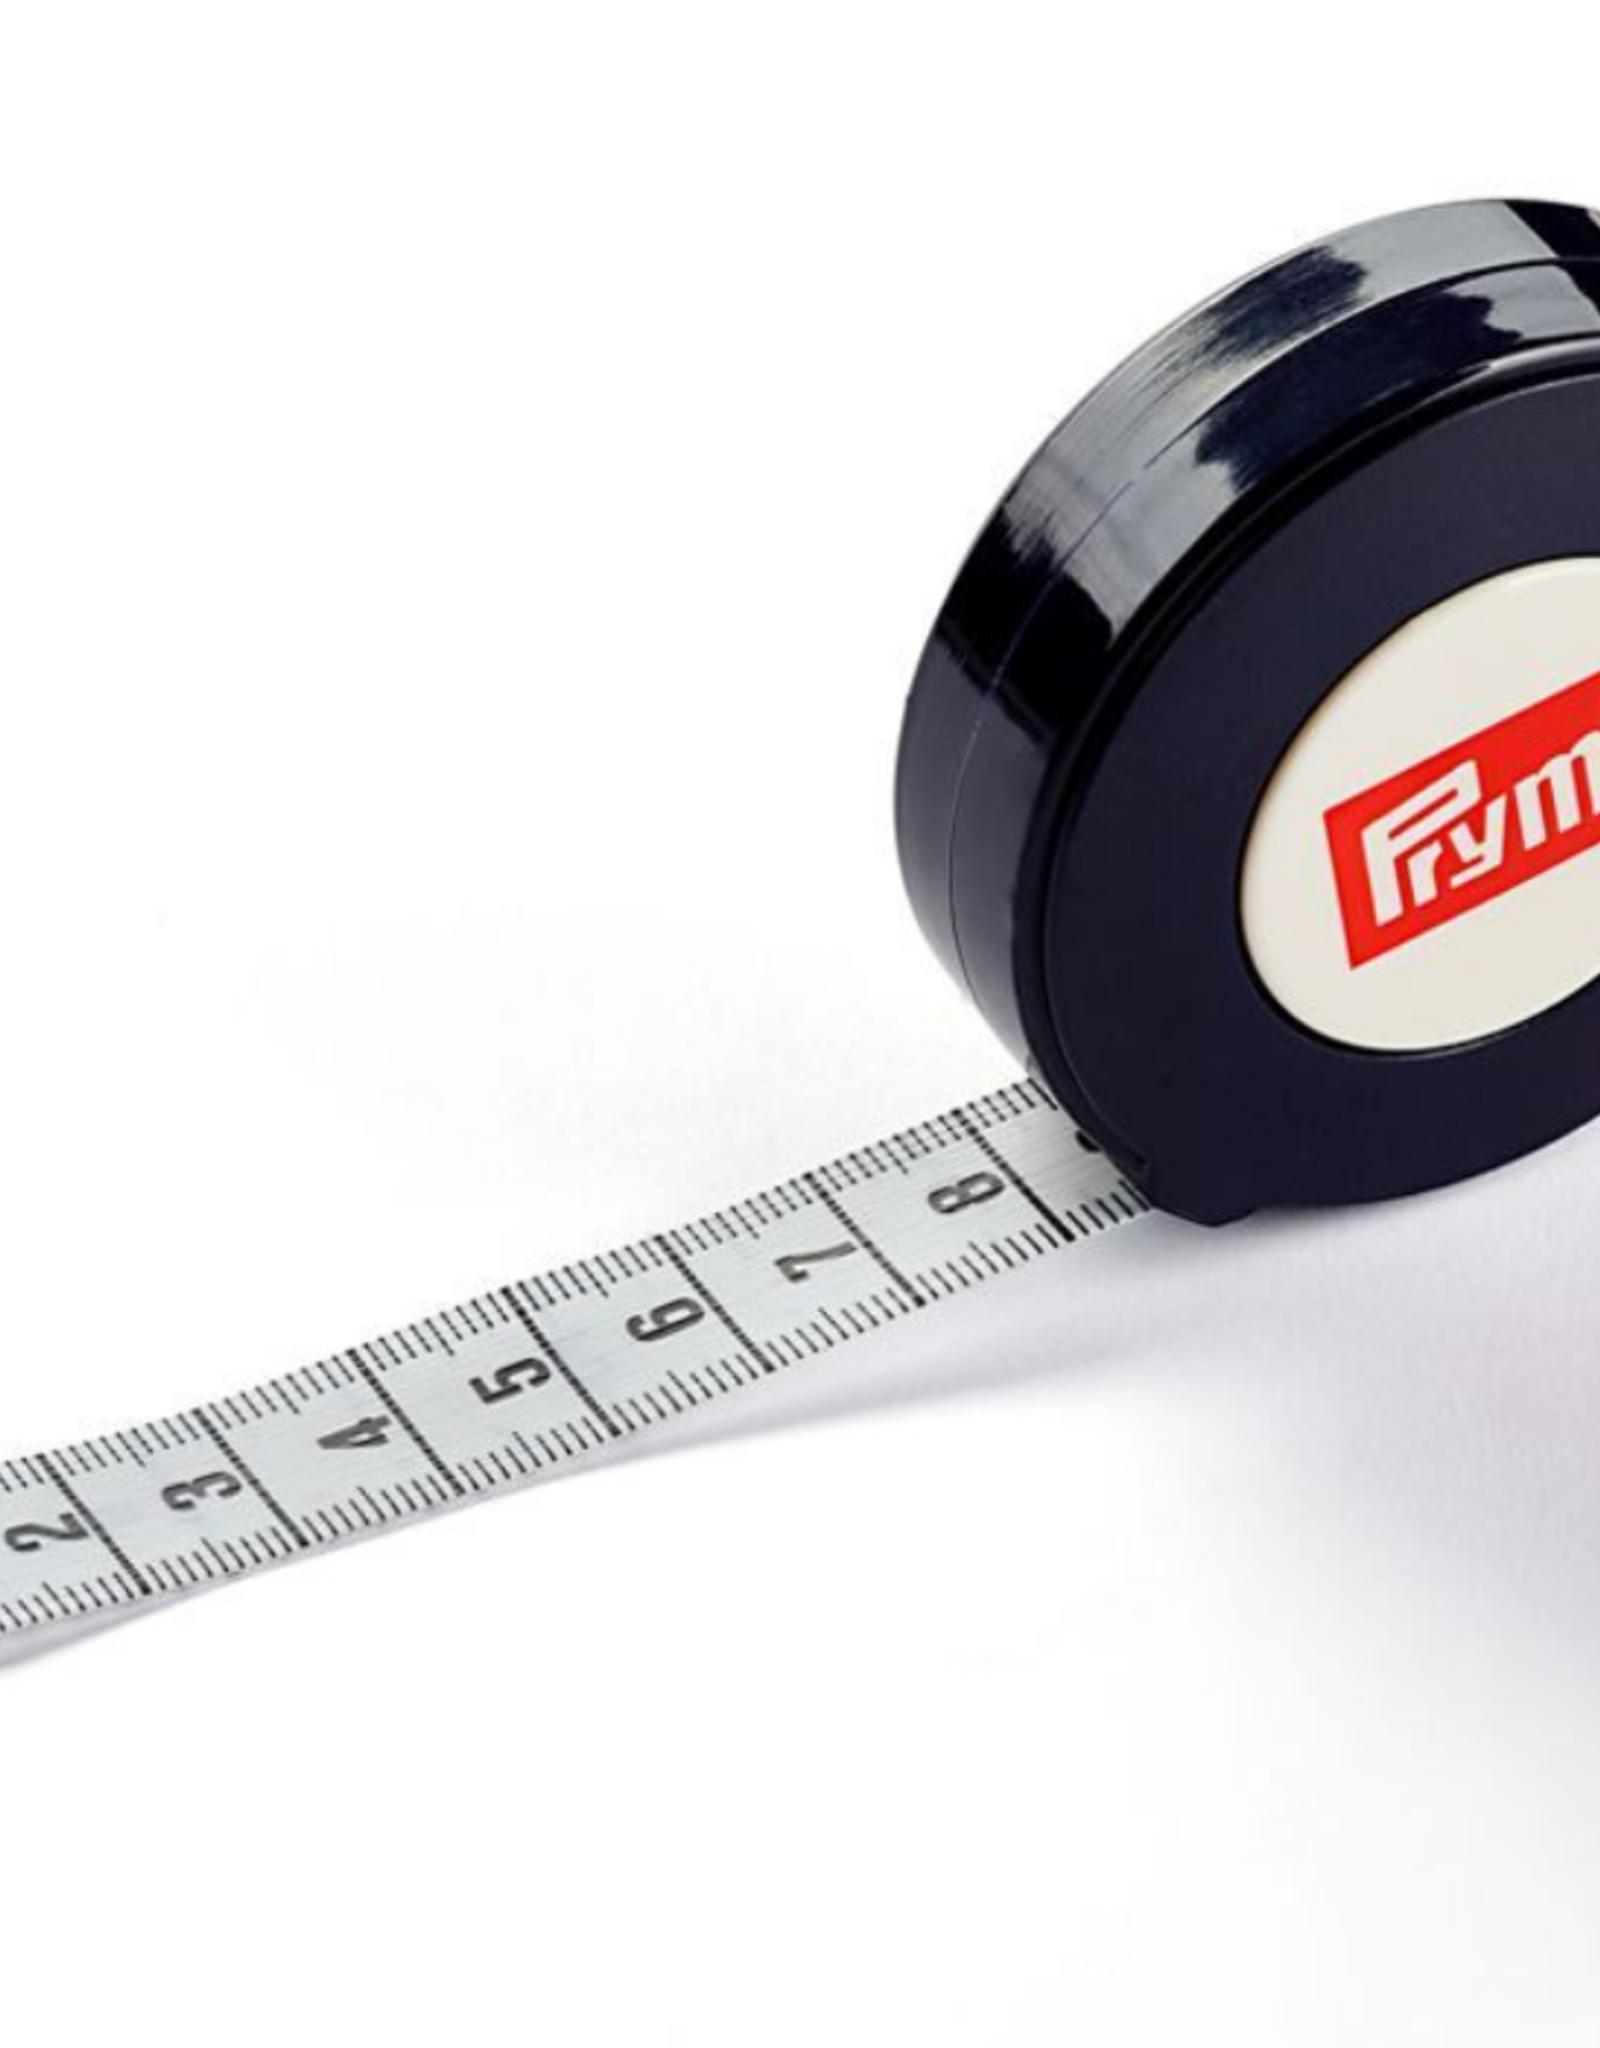 Prym Prym 282.260- Rolmeter Jumbo 300m